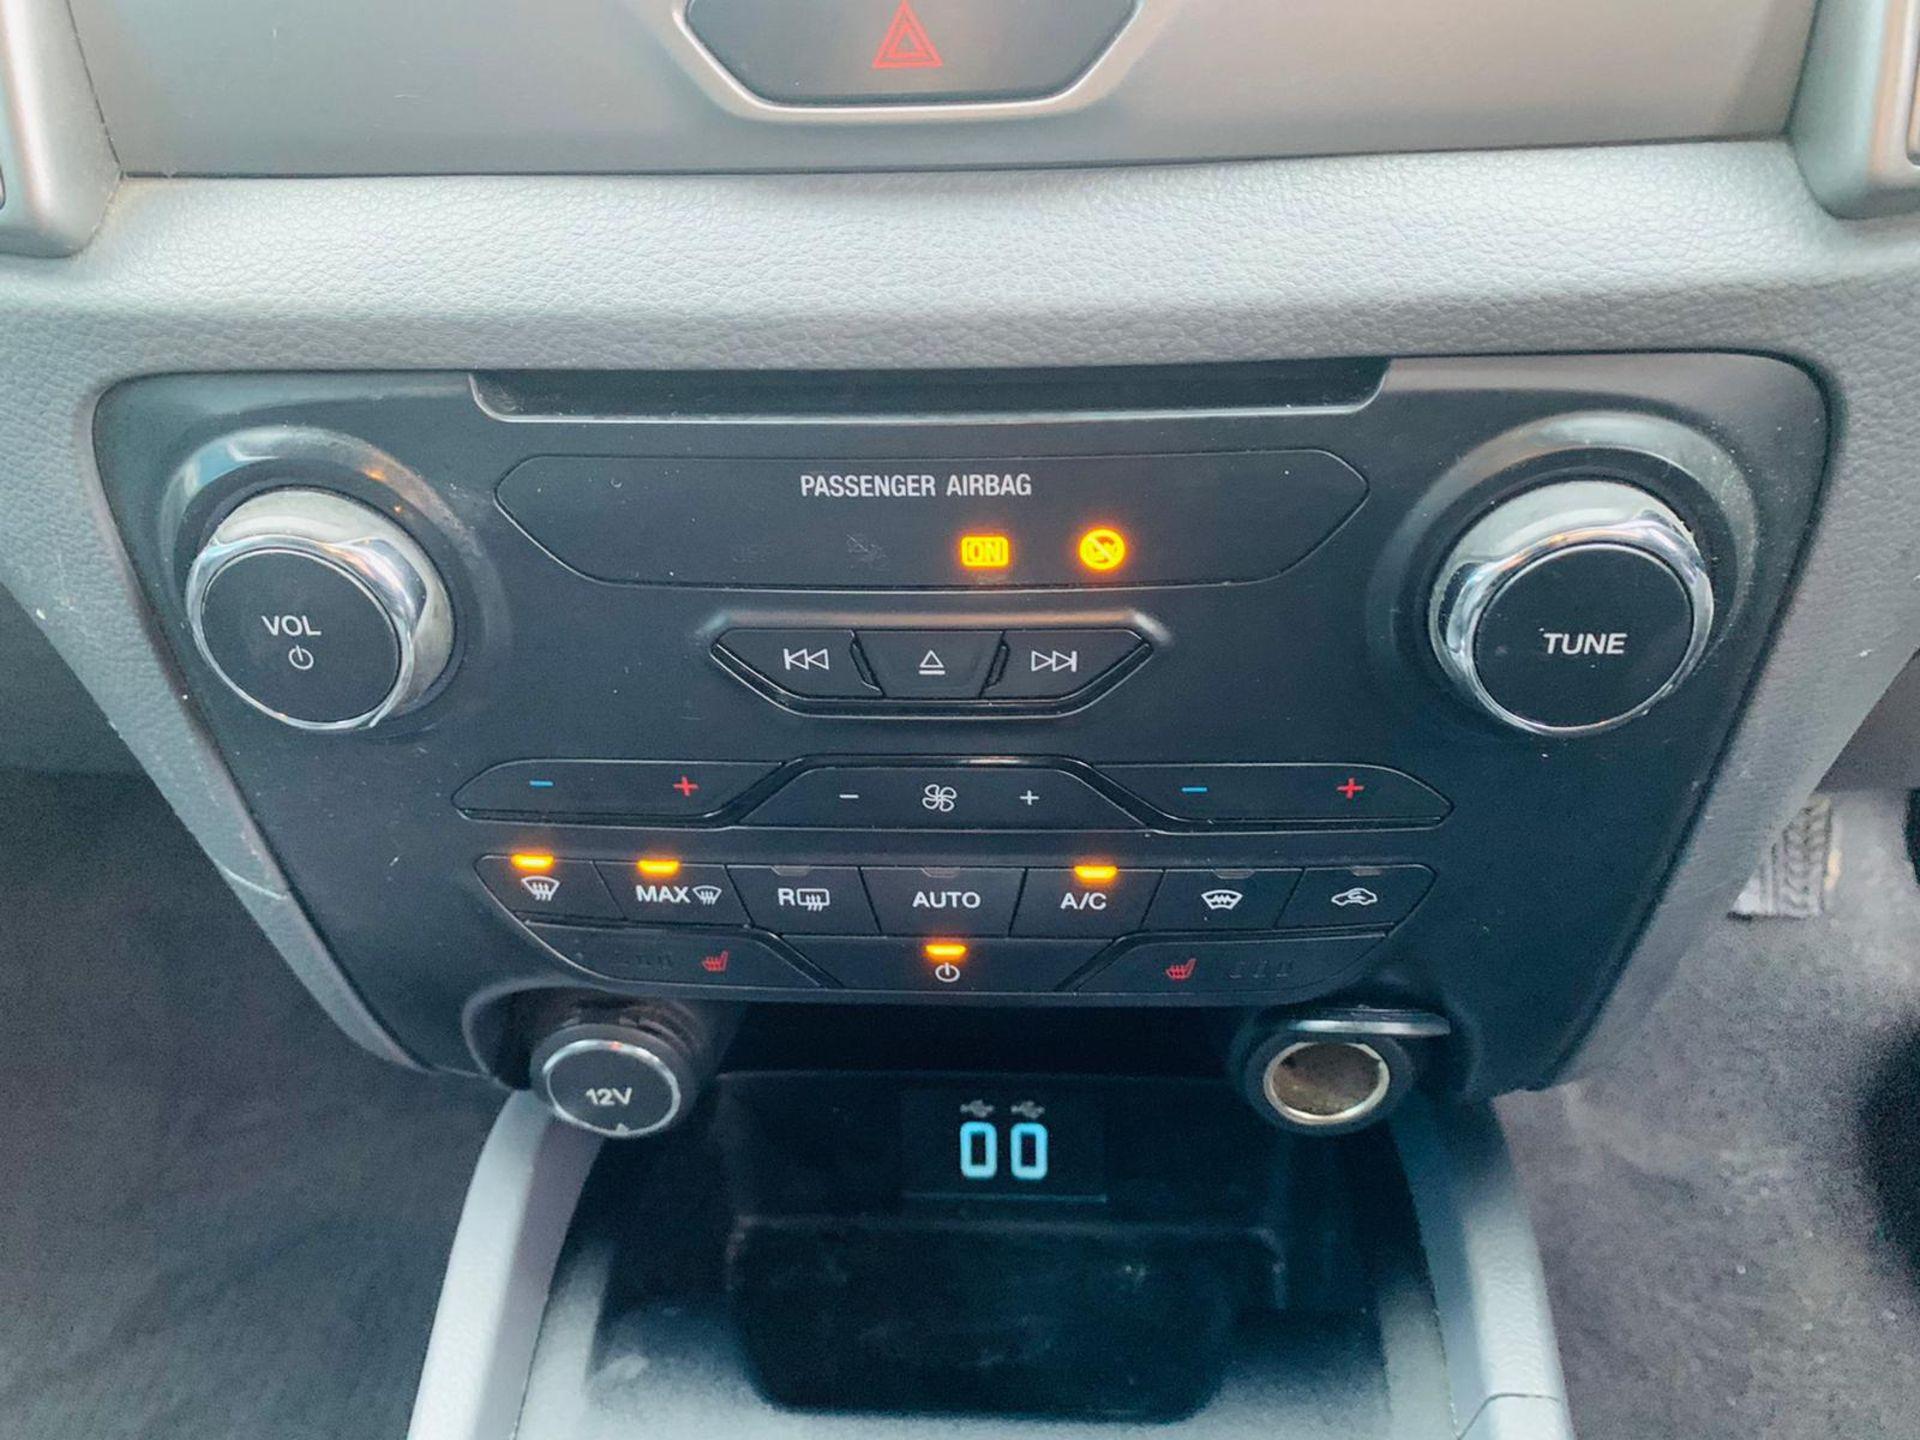 (RESERVE MET) Ford Ranger 2.2 TDCI LTD 4x4 Double Cab 2017 17 Reg - Reversing Cam -Leather - Sat Nav - Image 19 of 32